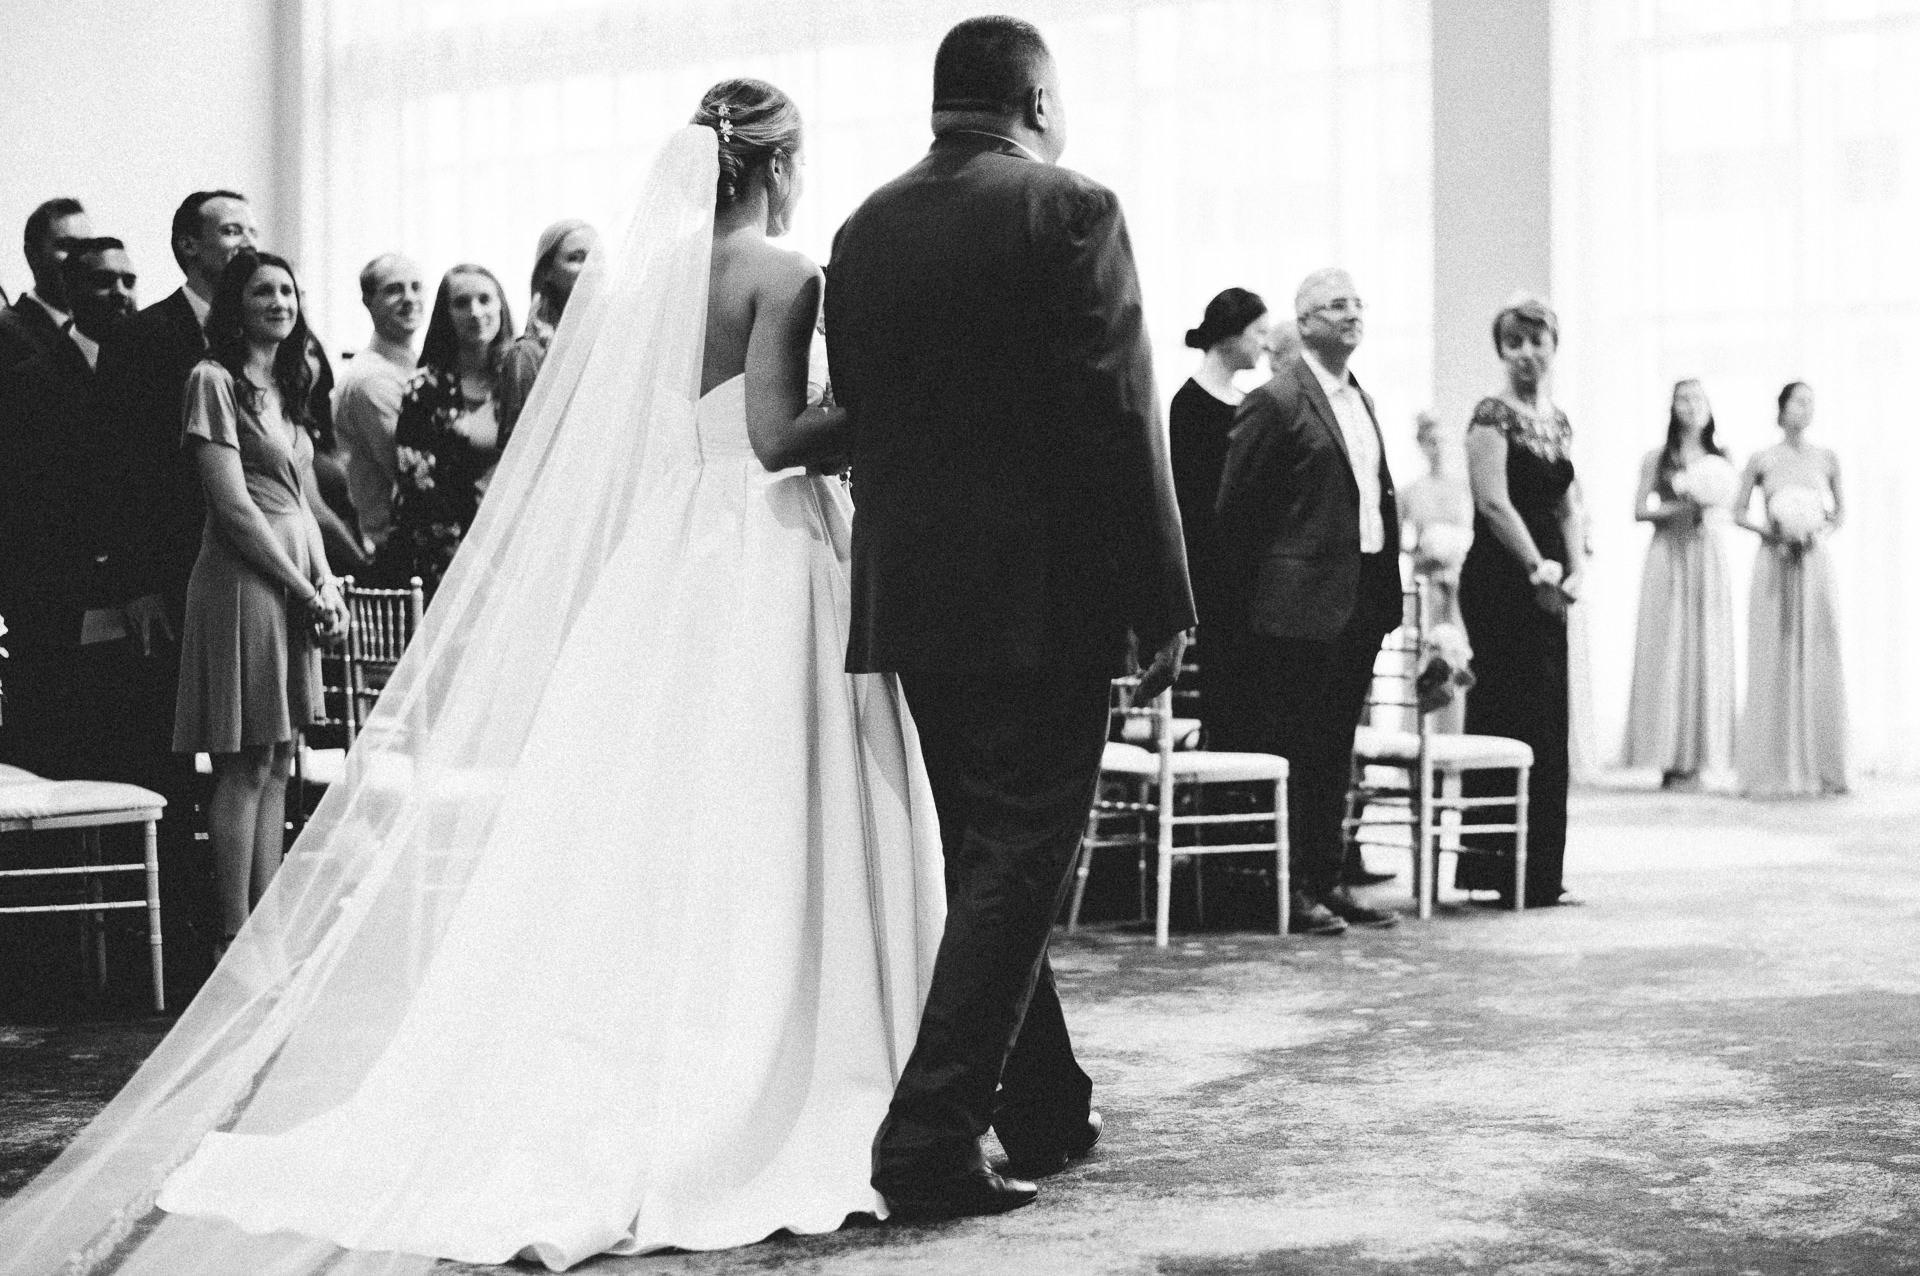 Dowtown Hilton Cleveland Wedding Photographer 2 9.jpg